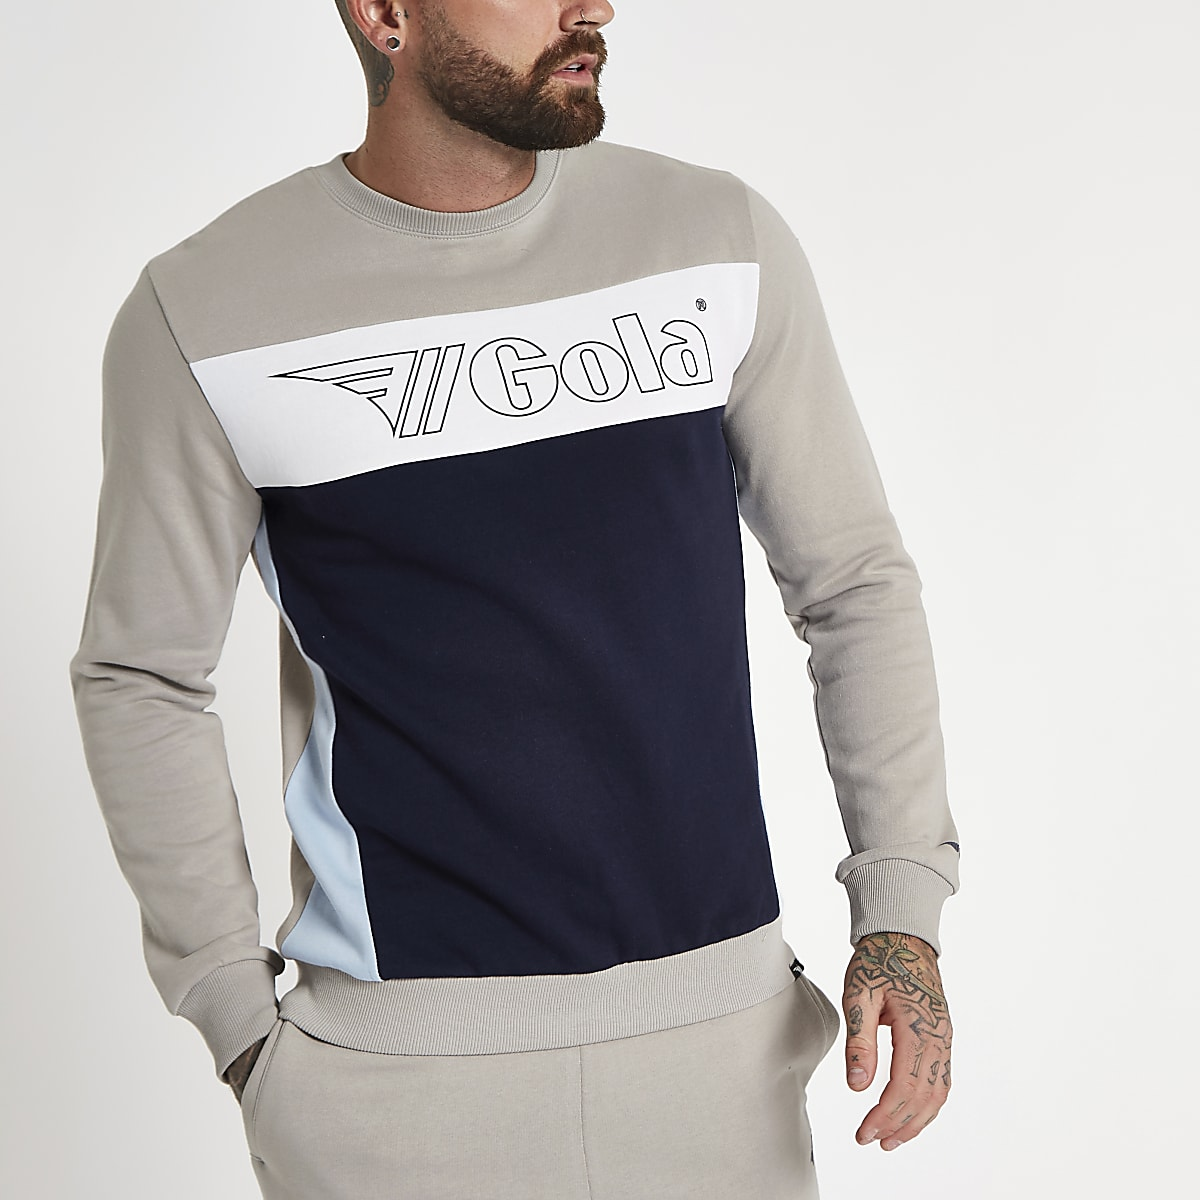 358f33c8 Gola stone logo panel print sweatshirt - Sweatshirts - Hoodies &  Sweatshirts - men